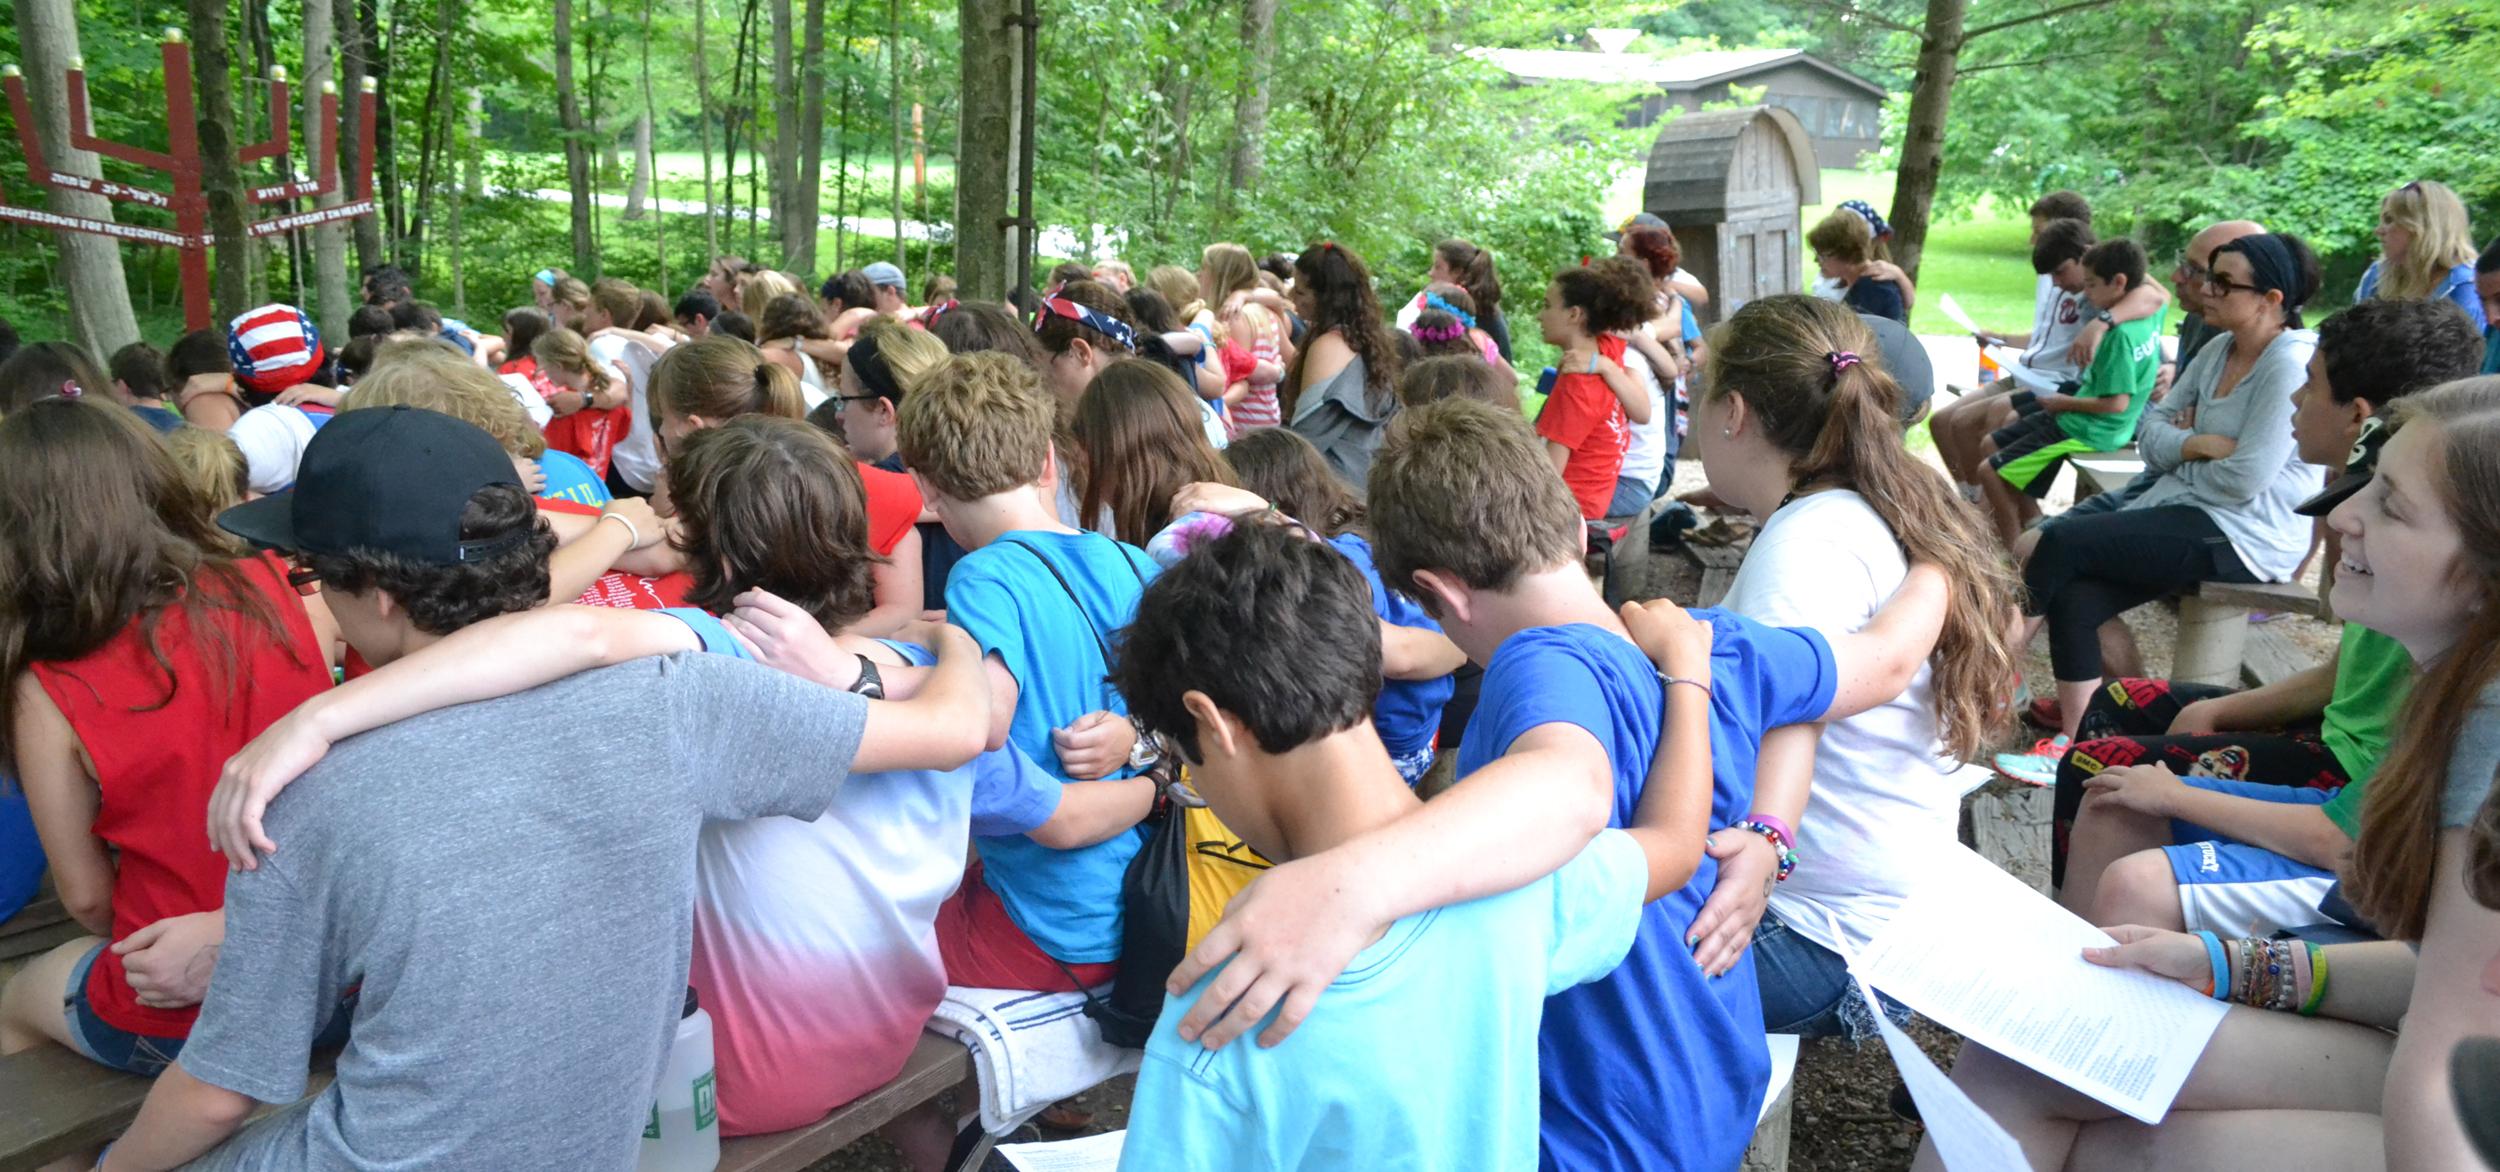 Summer Program - Jewish   URJ Goldman Union Camp Institute (GUCI)